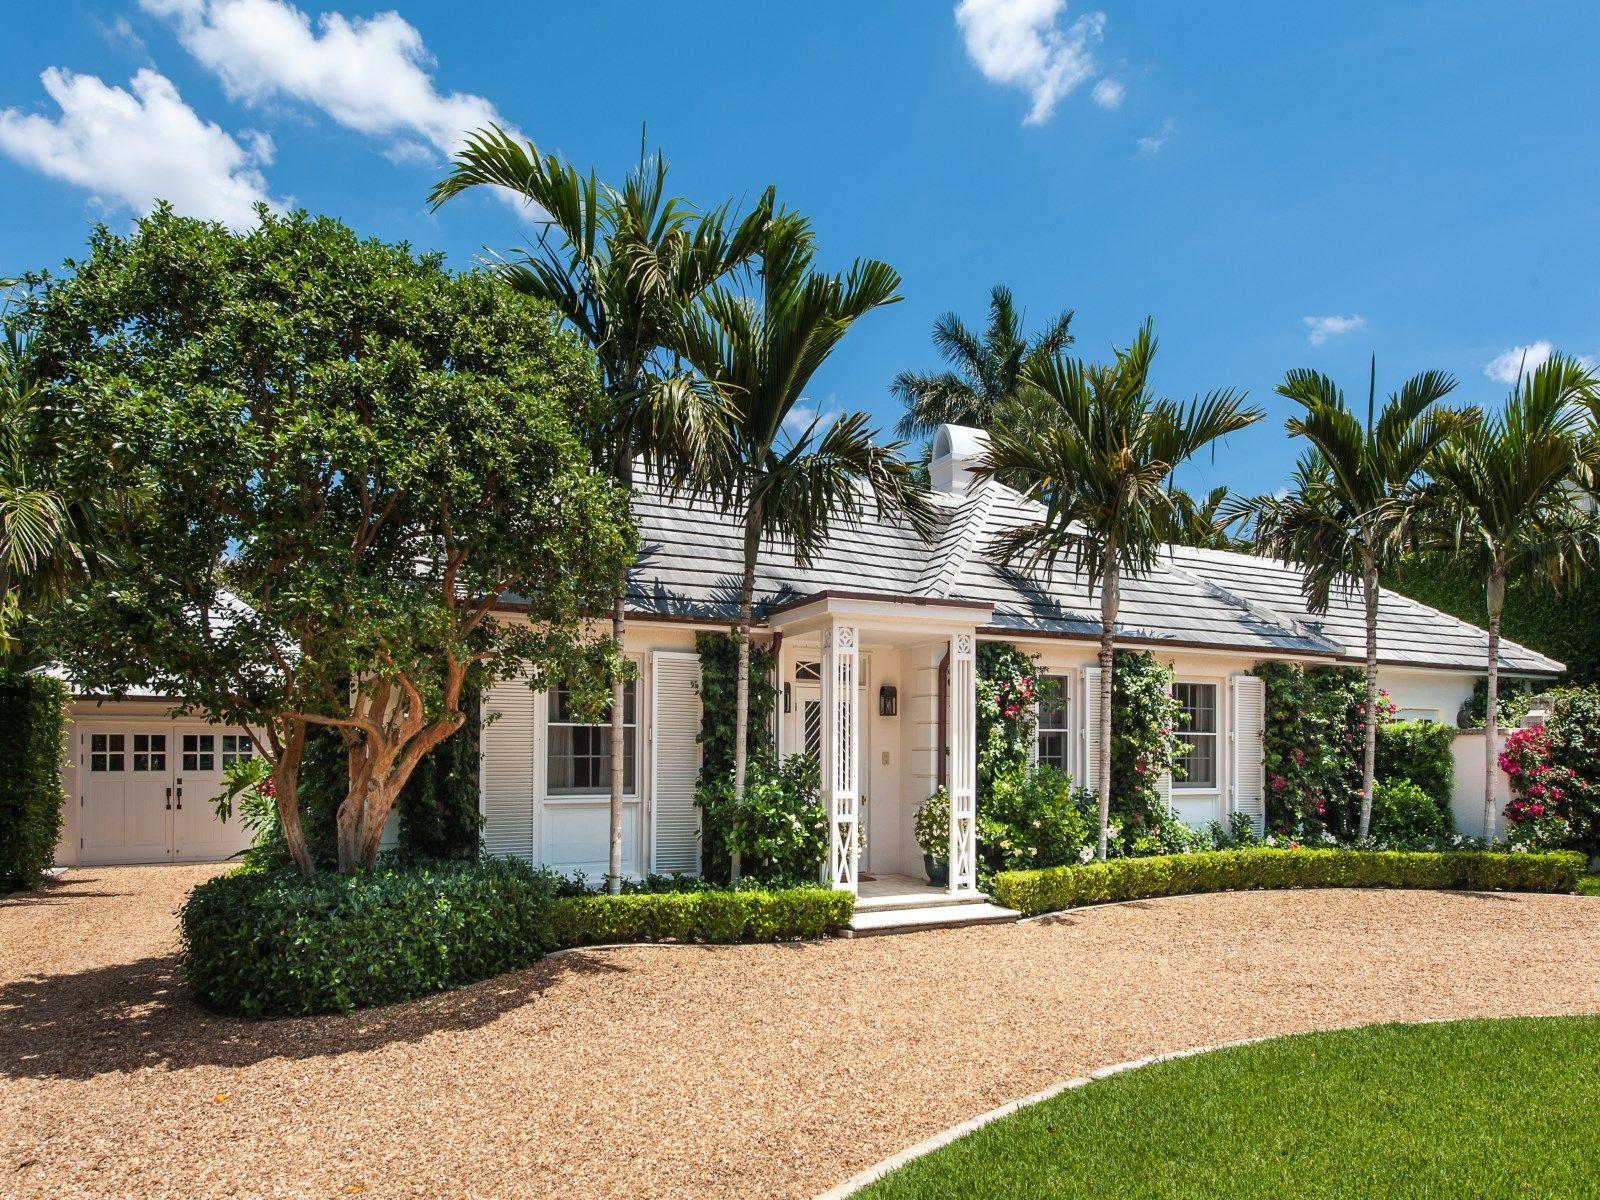 230ddf4907fc04292e1b818b1b7f8895 - Palm Gardens Rehab Vero Beach Florida